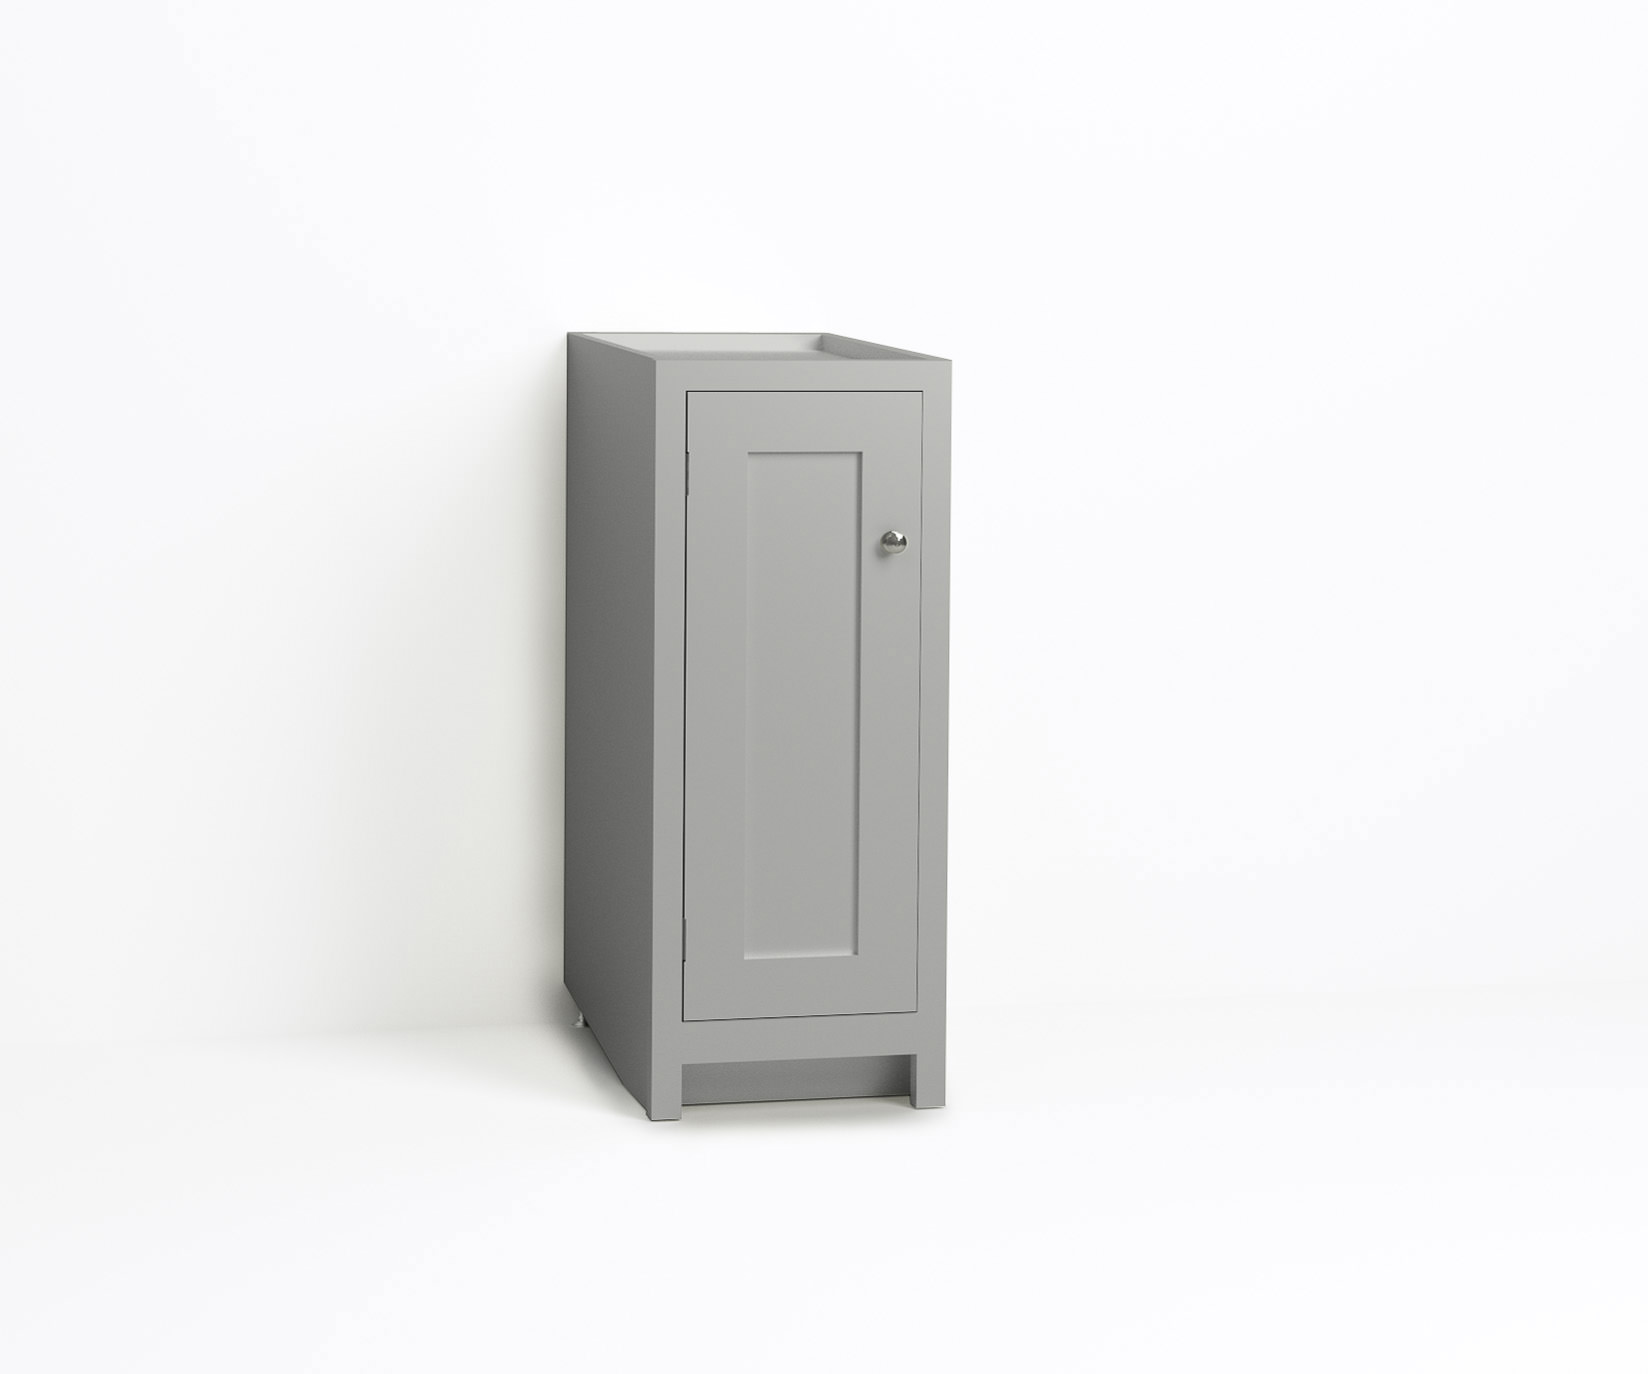 Kitchen Furniture Catalogue: Shaker Kitchen Catalogue - Base Cabinets